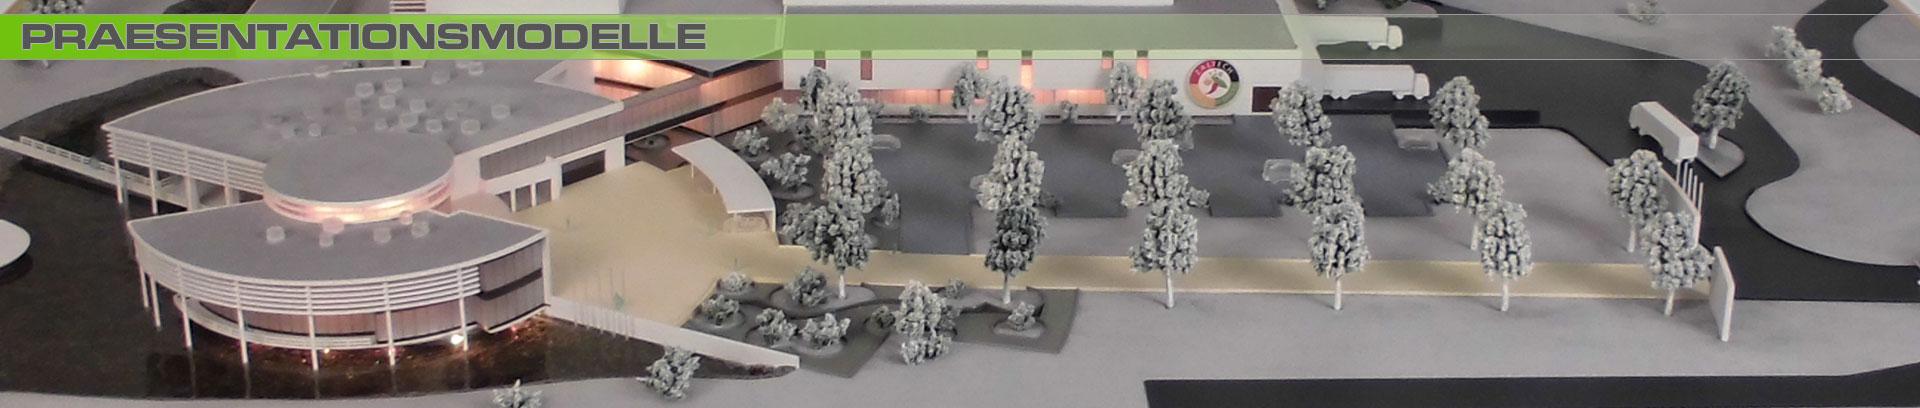 Praesentationmodell Zaltech Zentrale